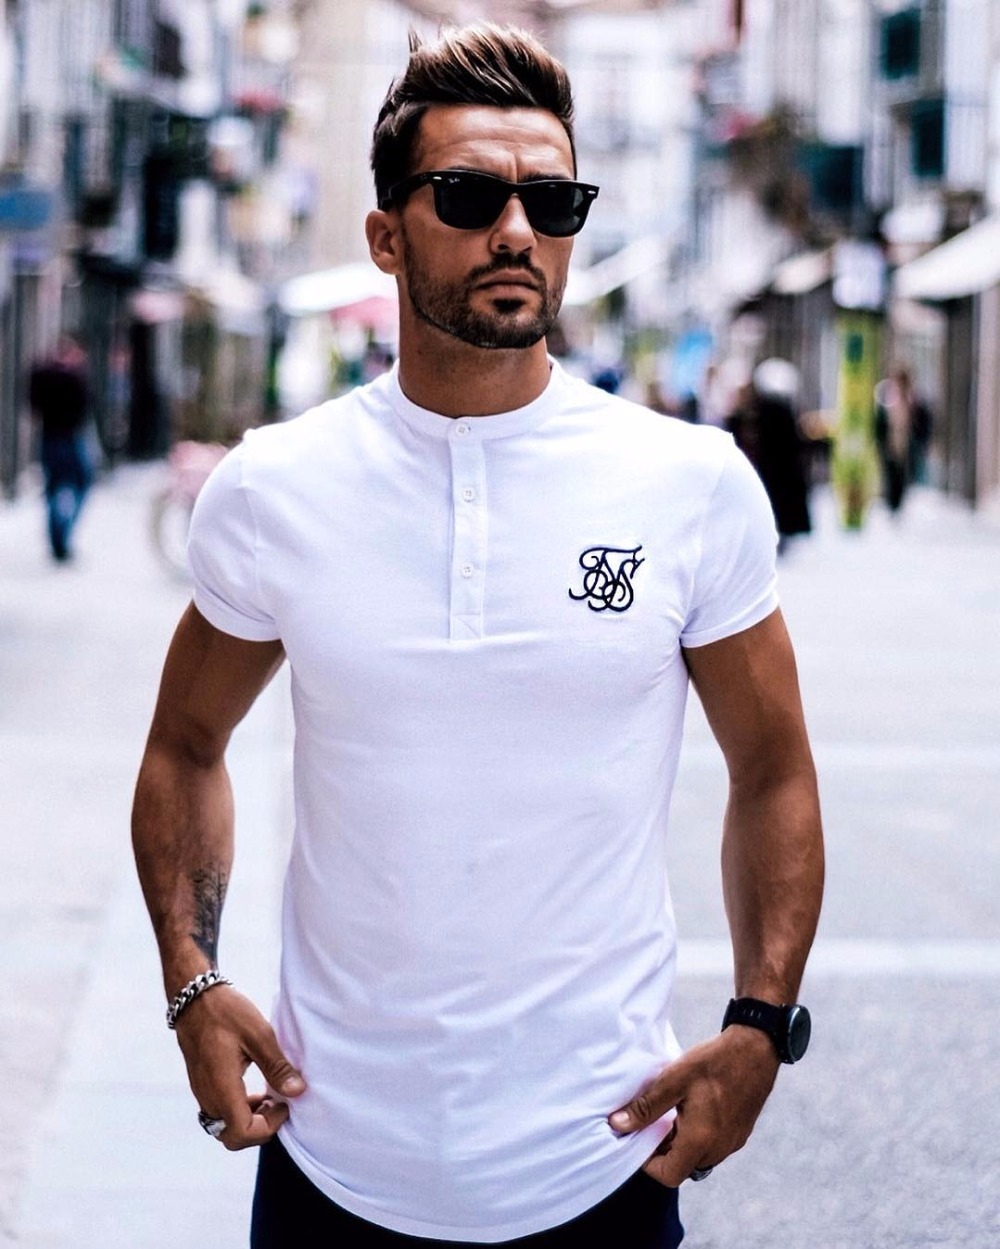 Men Fashion Summer Ss Sik Silk Kanye West Sik Silk Embroidery Men Casual Hip Hop Irregular Curved Hem Short Sleeve Cotton Shirts